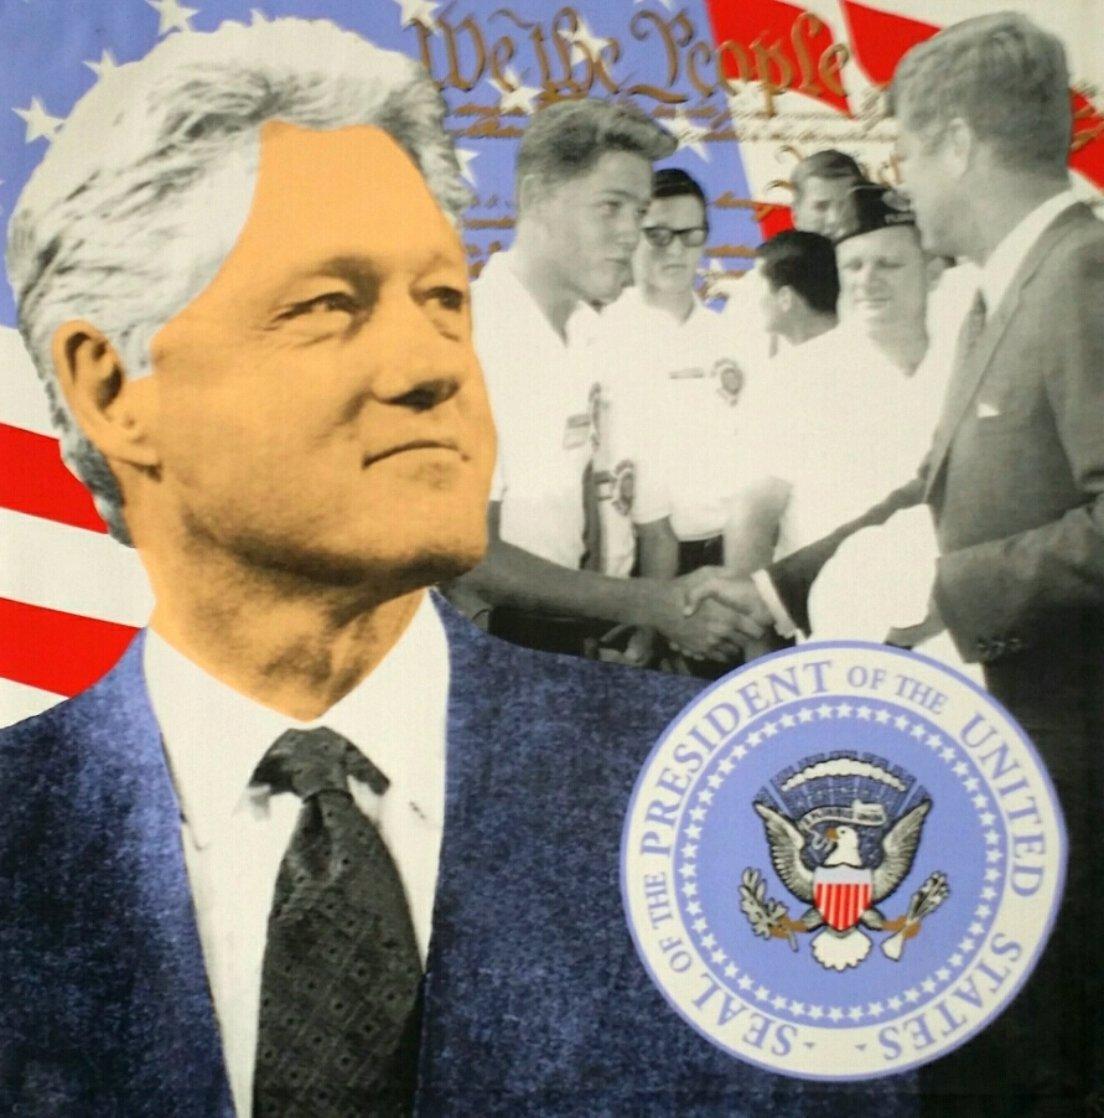 Bill Clinton Dark Blue 2004 Embellished Limited Edition Print by Steve Kaufman